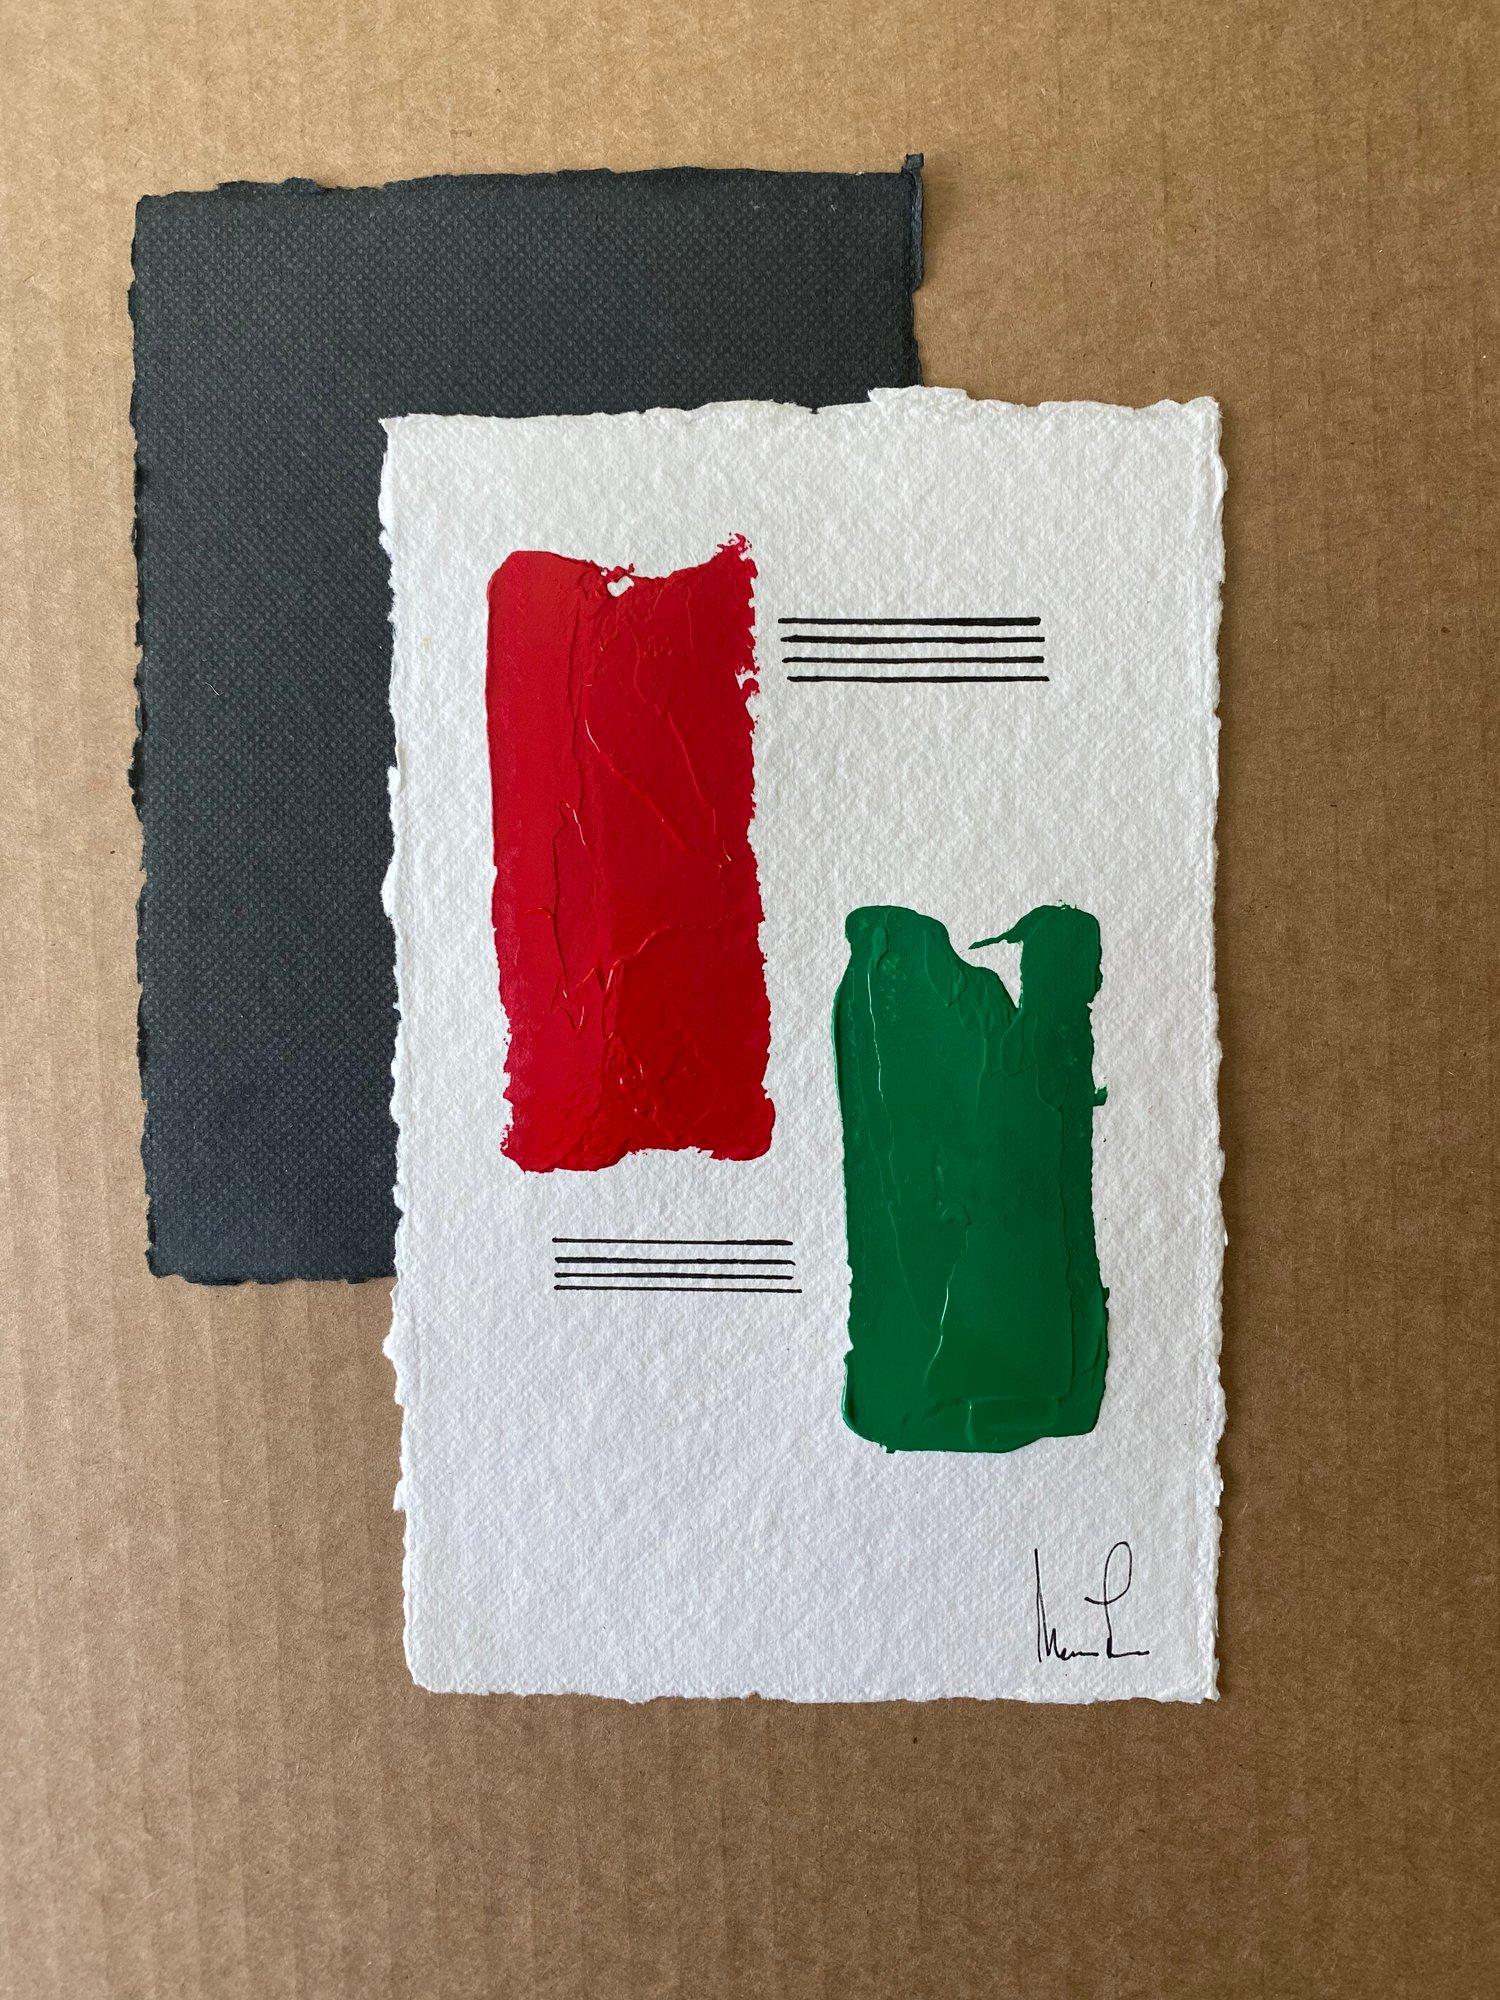 Image of Juneteenth ML Art (2)